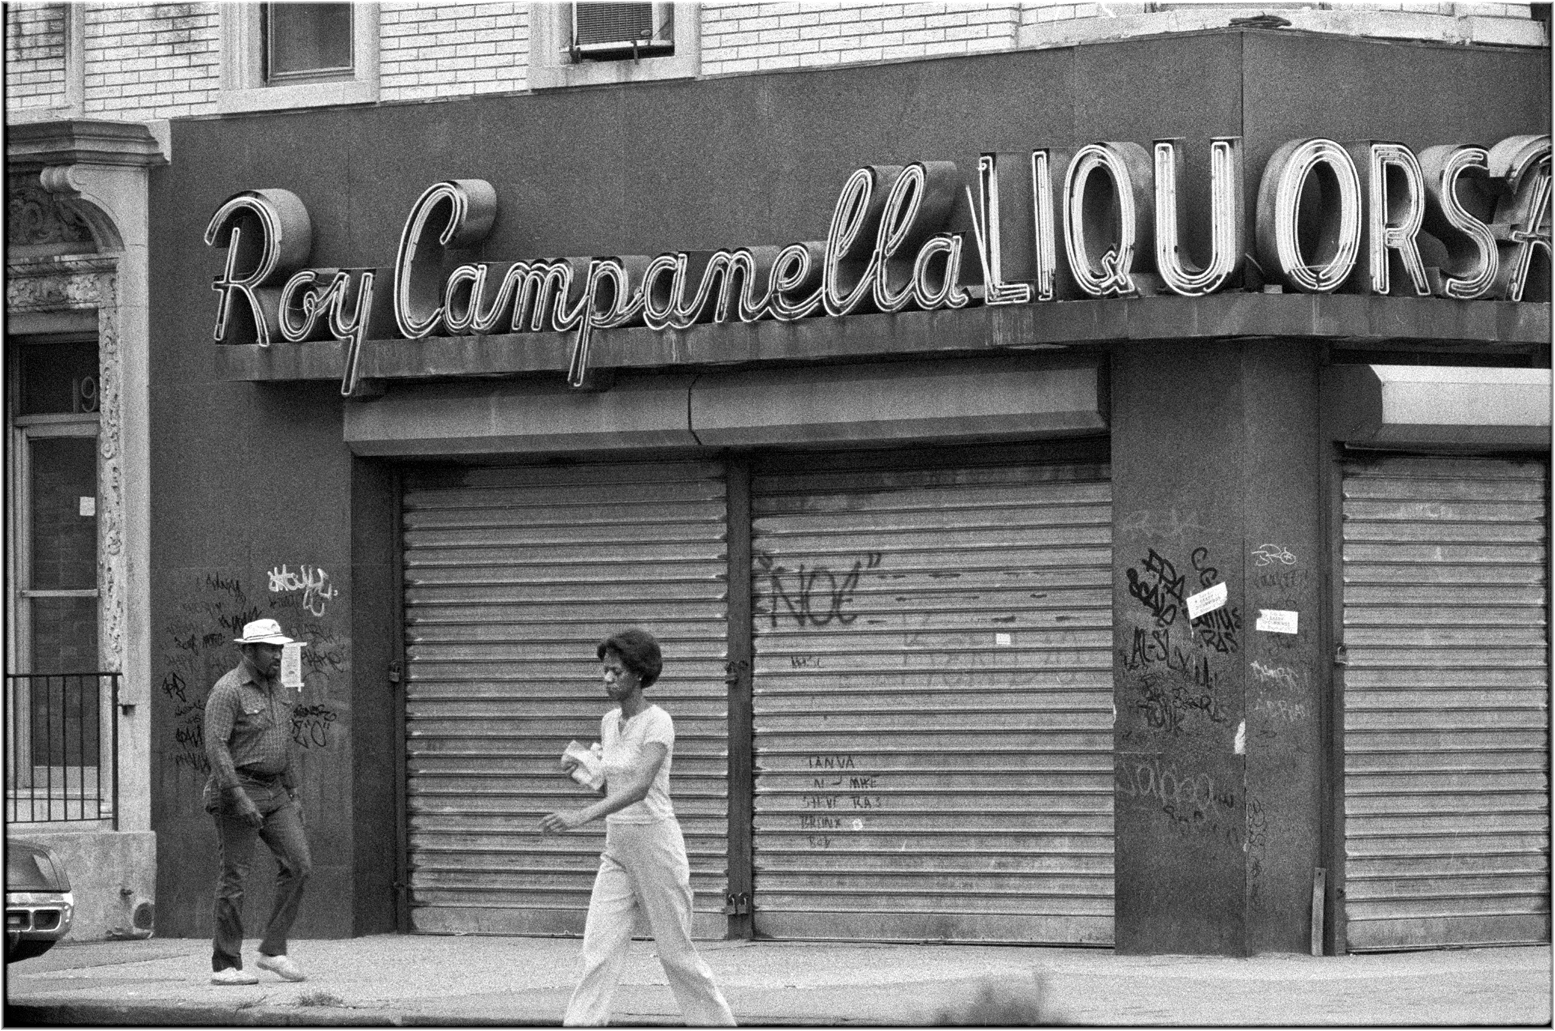 harlemroycampanella1985 copy � black and white street